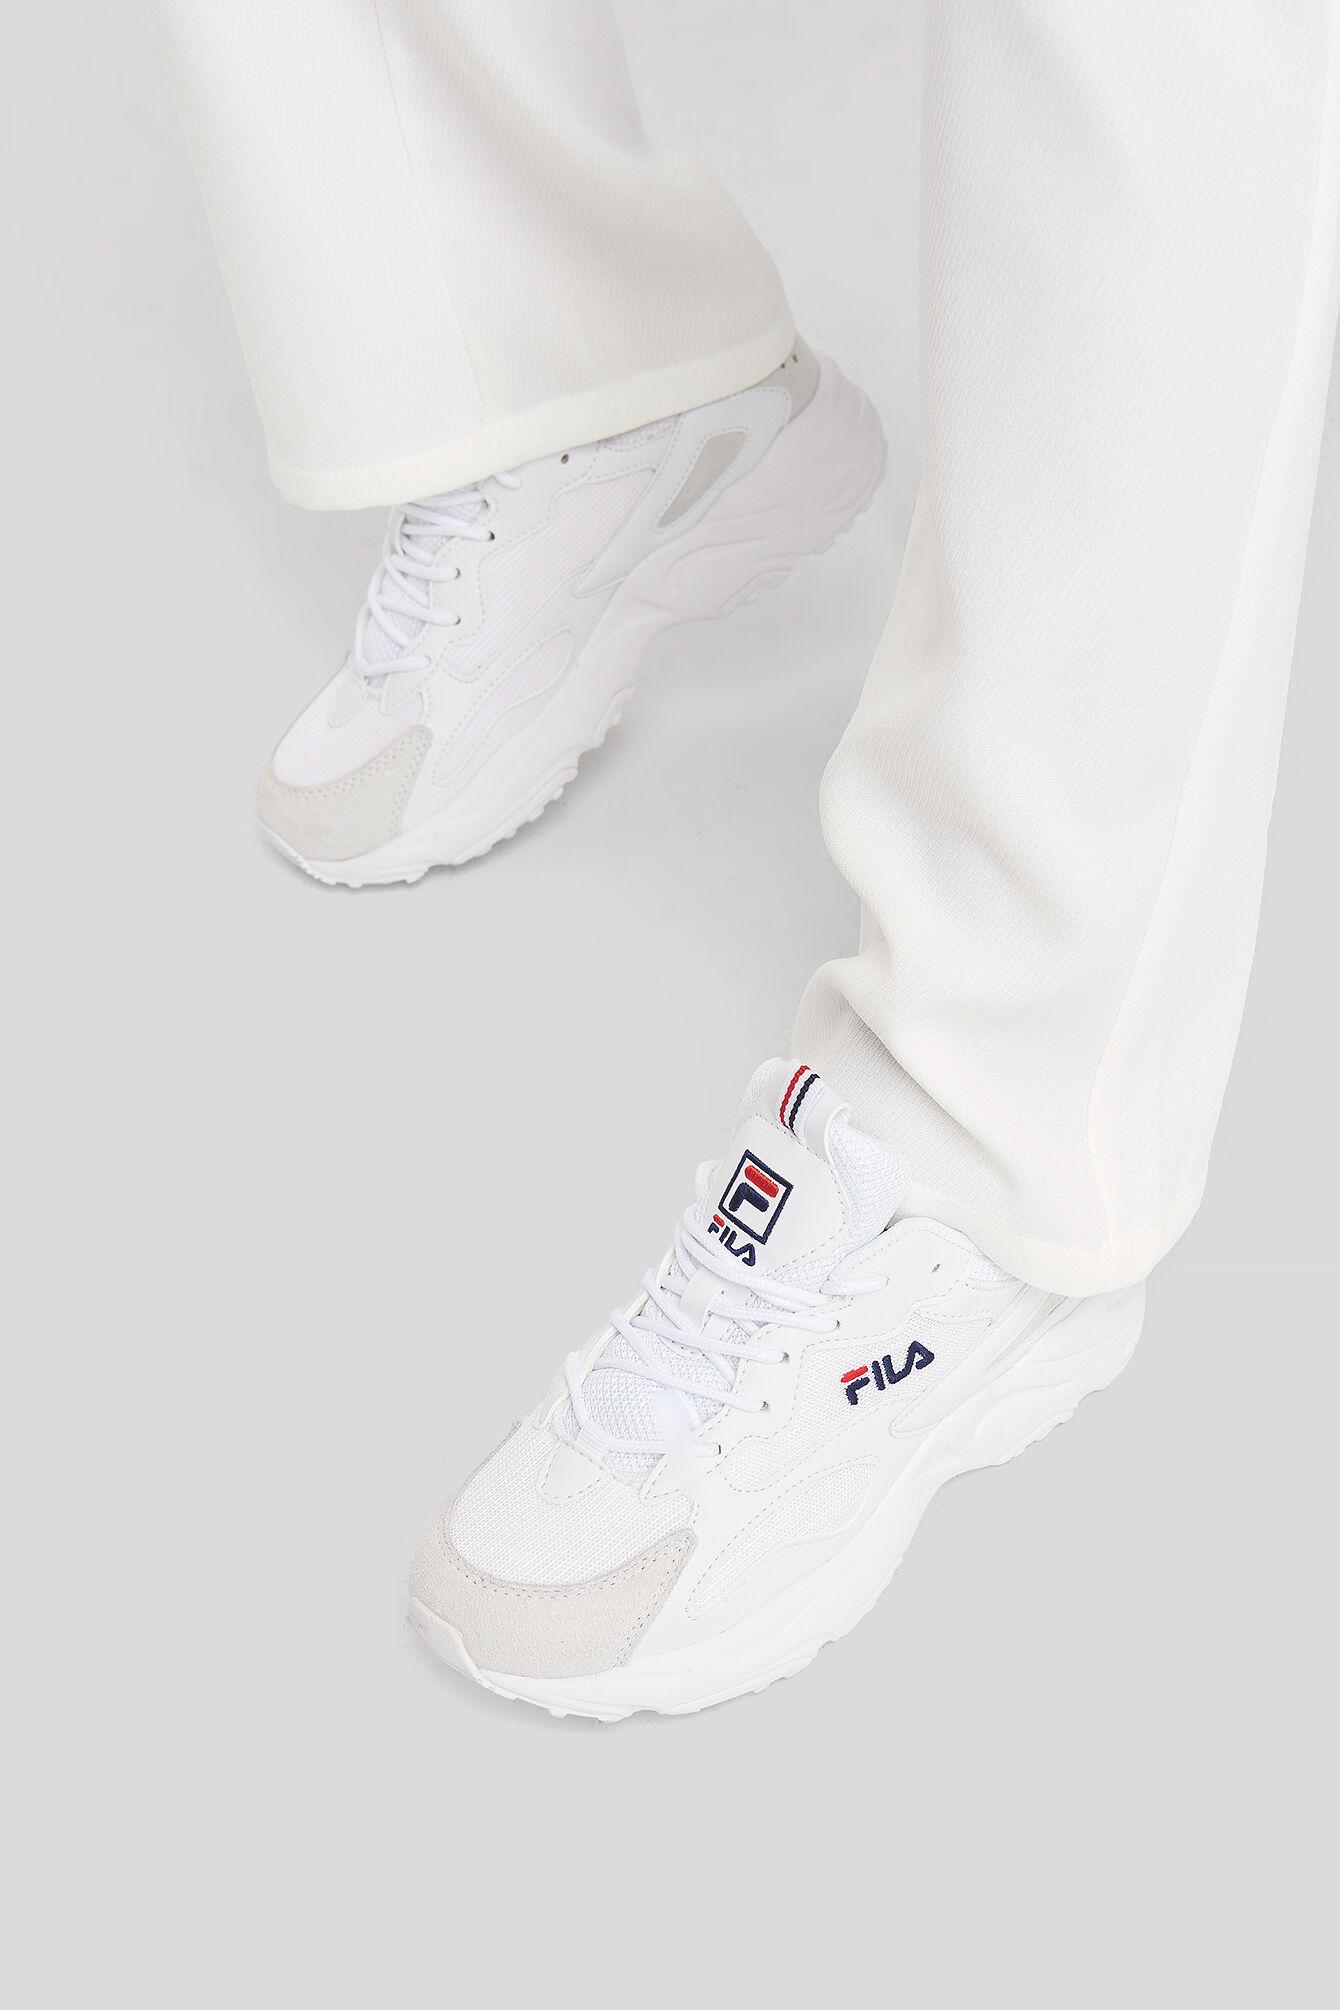 FILA Ray Tracer Wmn Sneaker - White